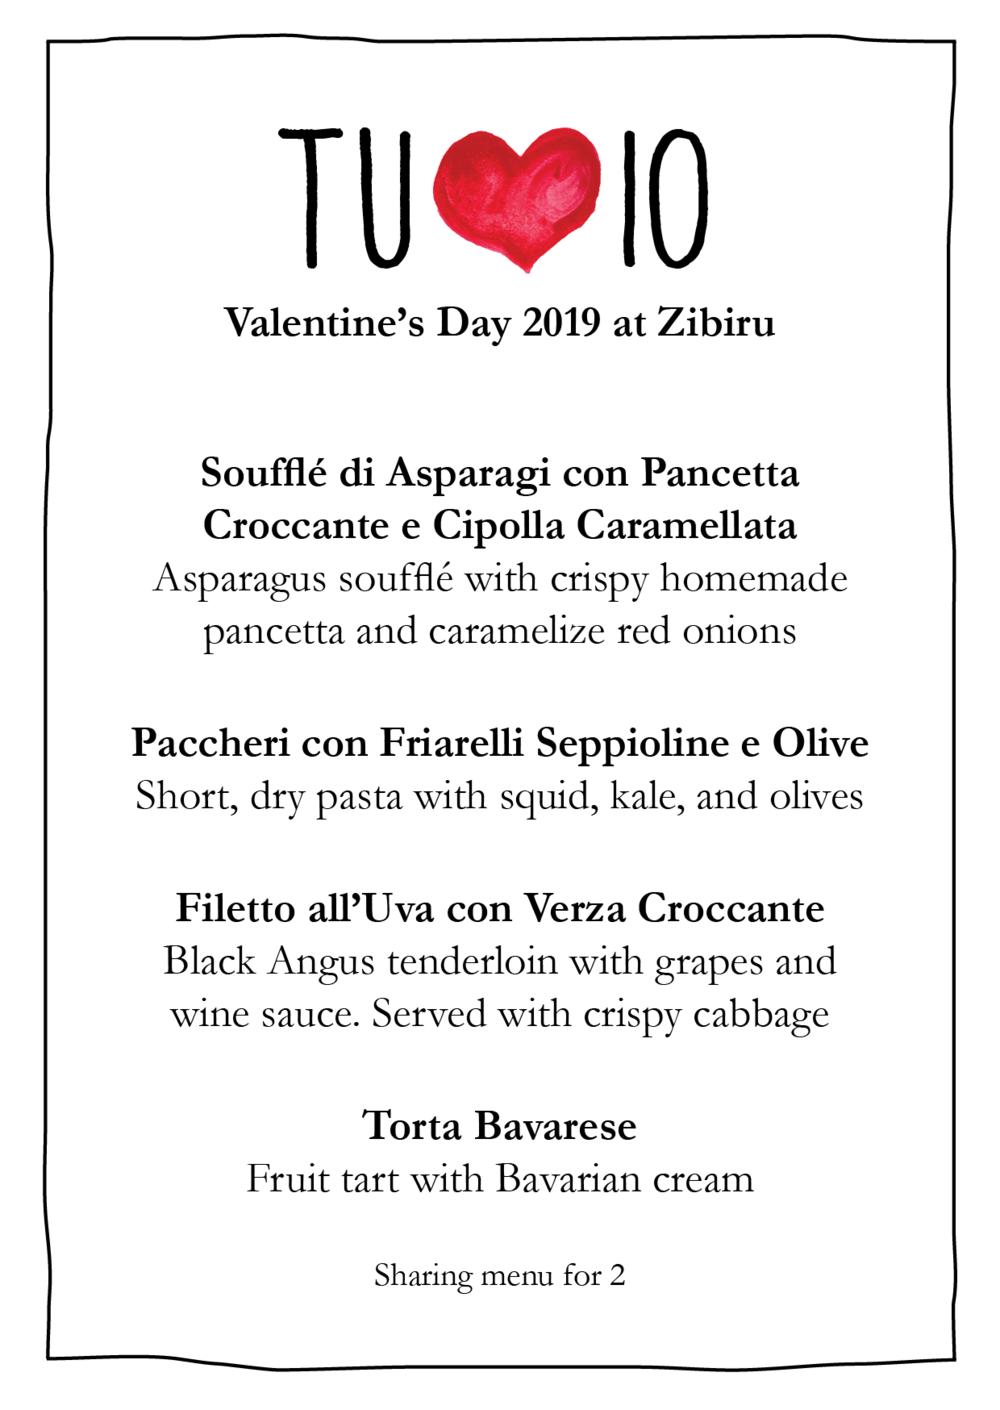 zibiru-italian-restaurant-seminyak-bali-valentines-day-2019-set-menu.png